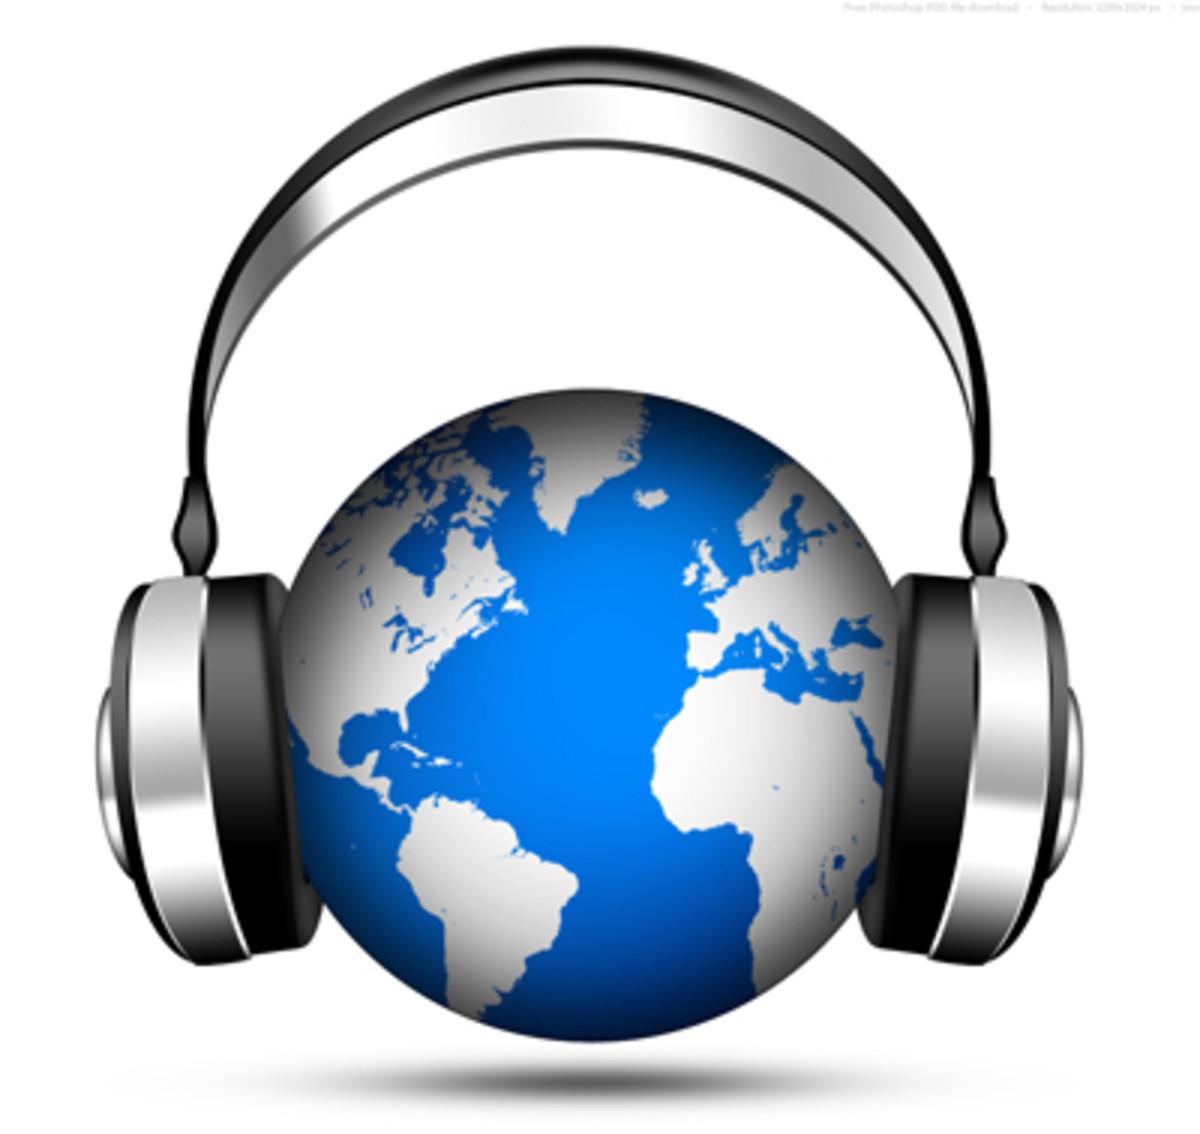 Radio in the Internet